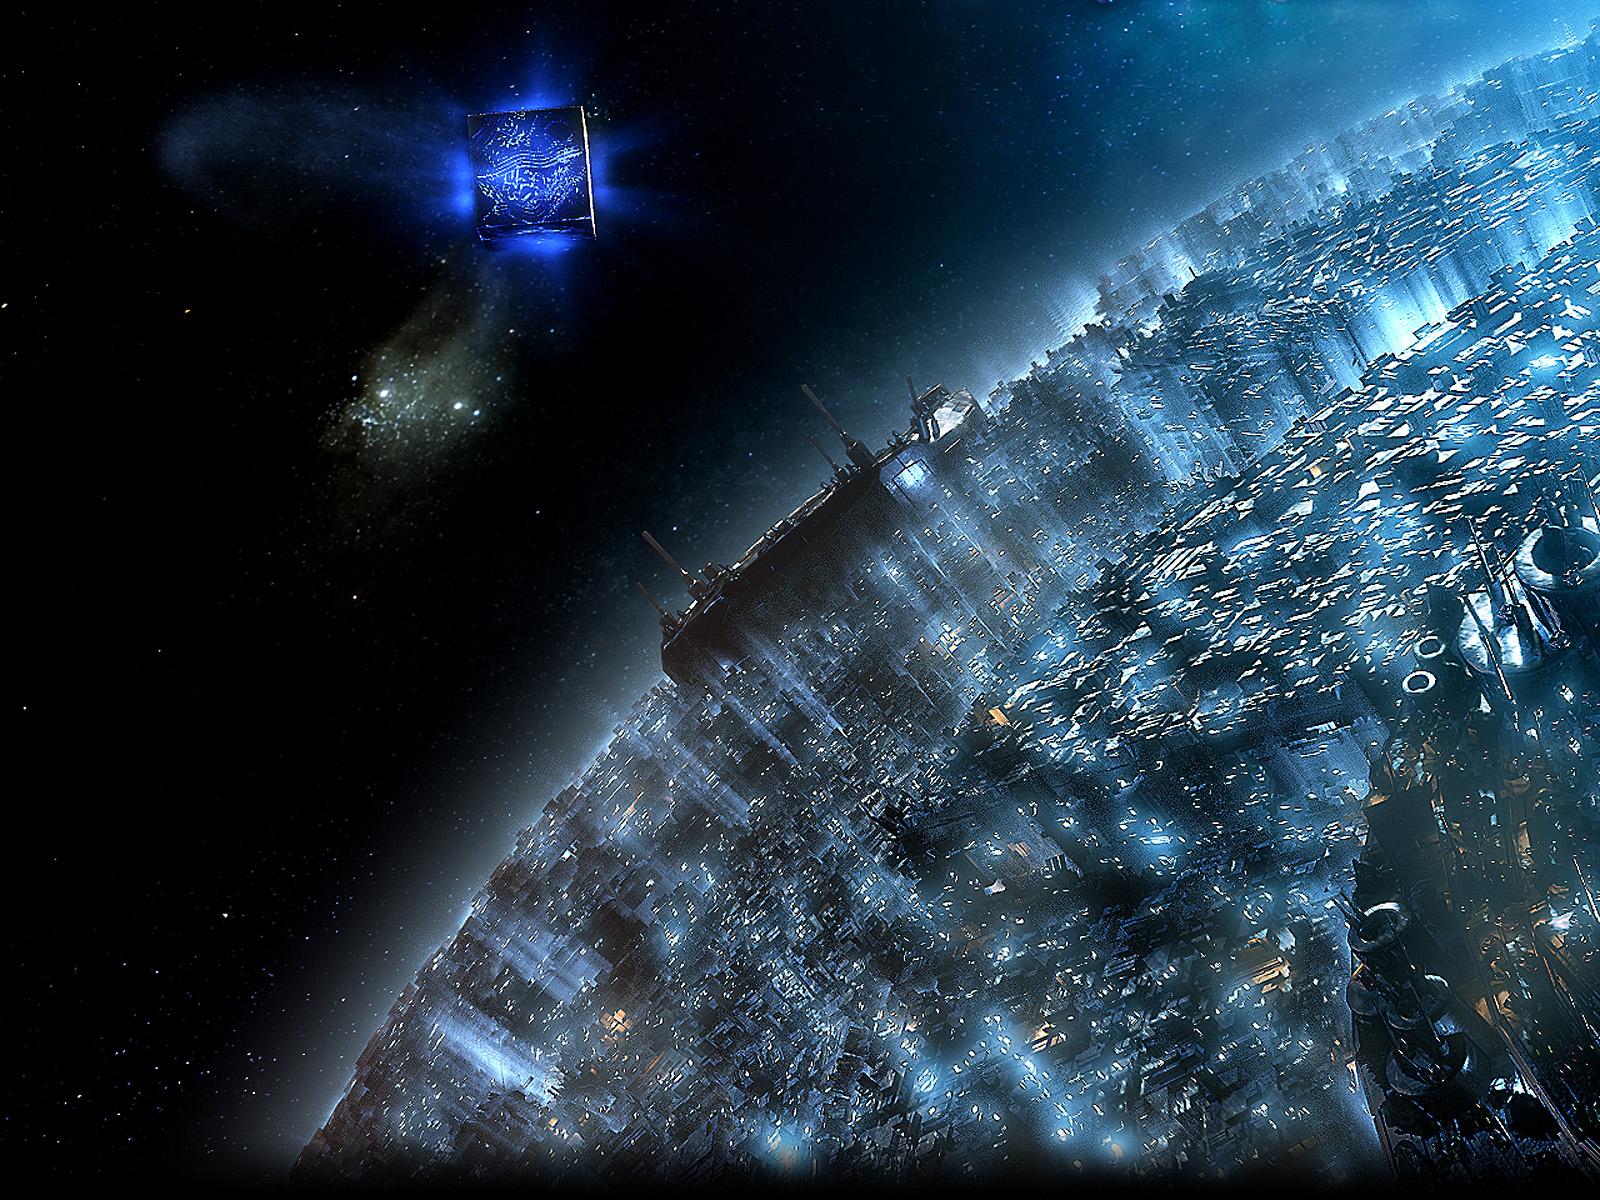 Transformers Fall Of Cybertron Hd Wallpapers 1080p 1600 215 1200 Cybertron Digital Citizen